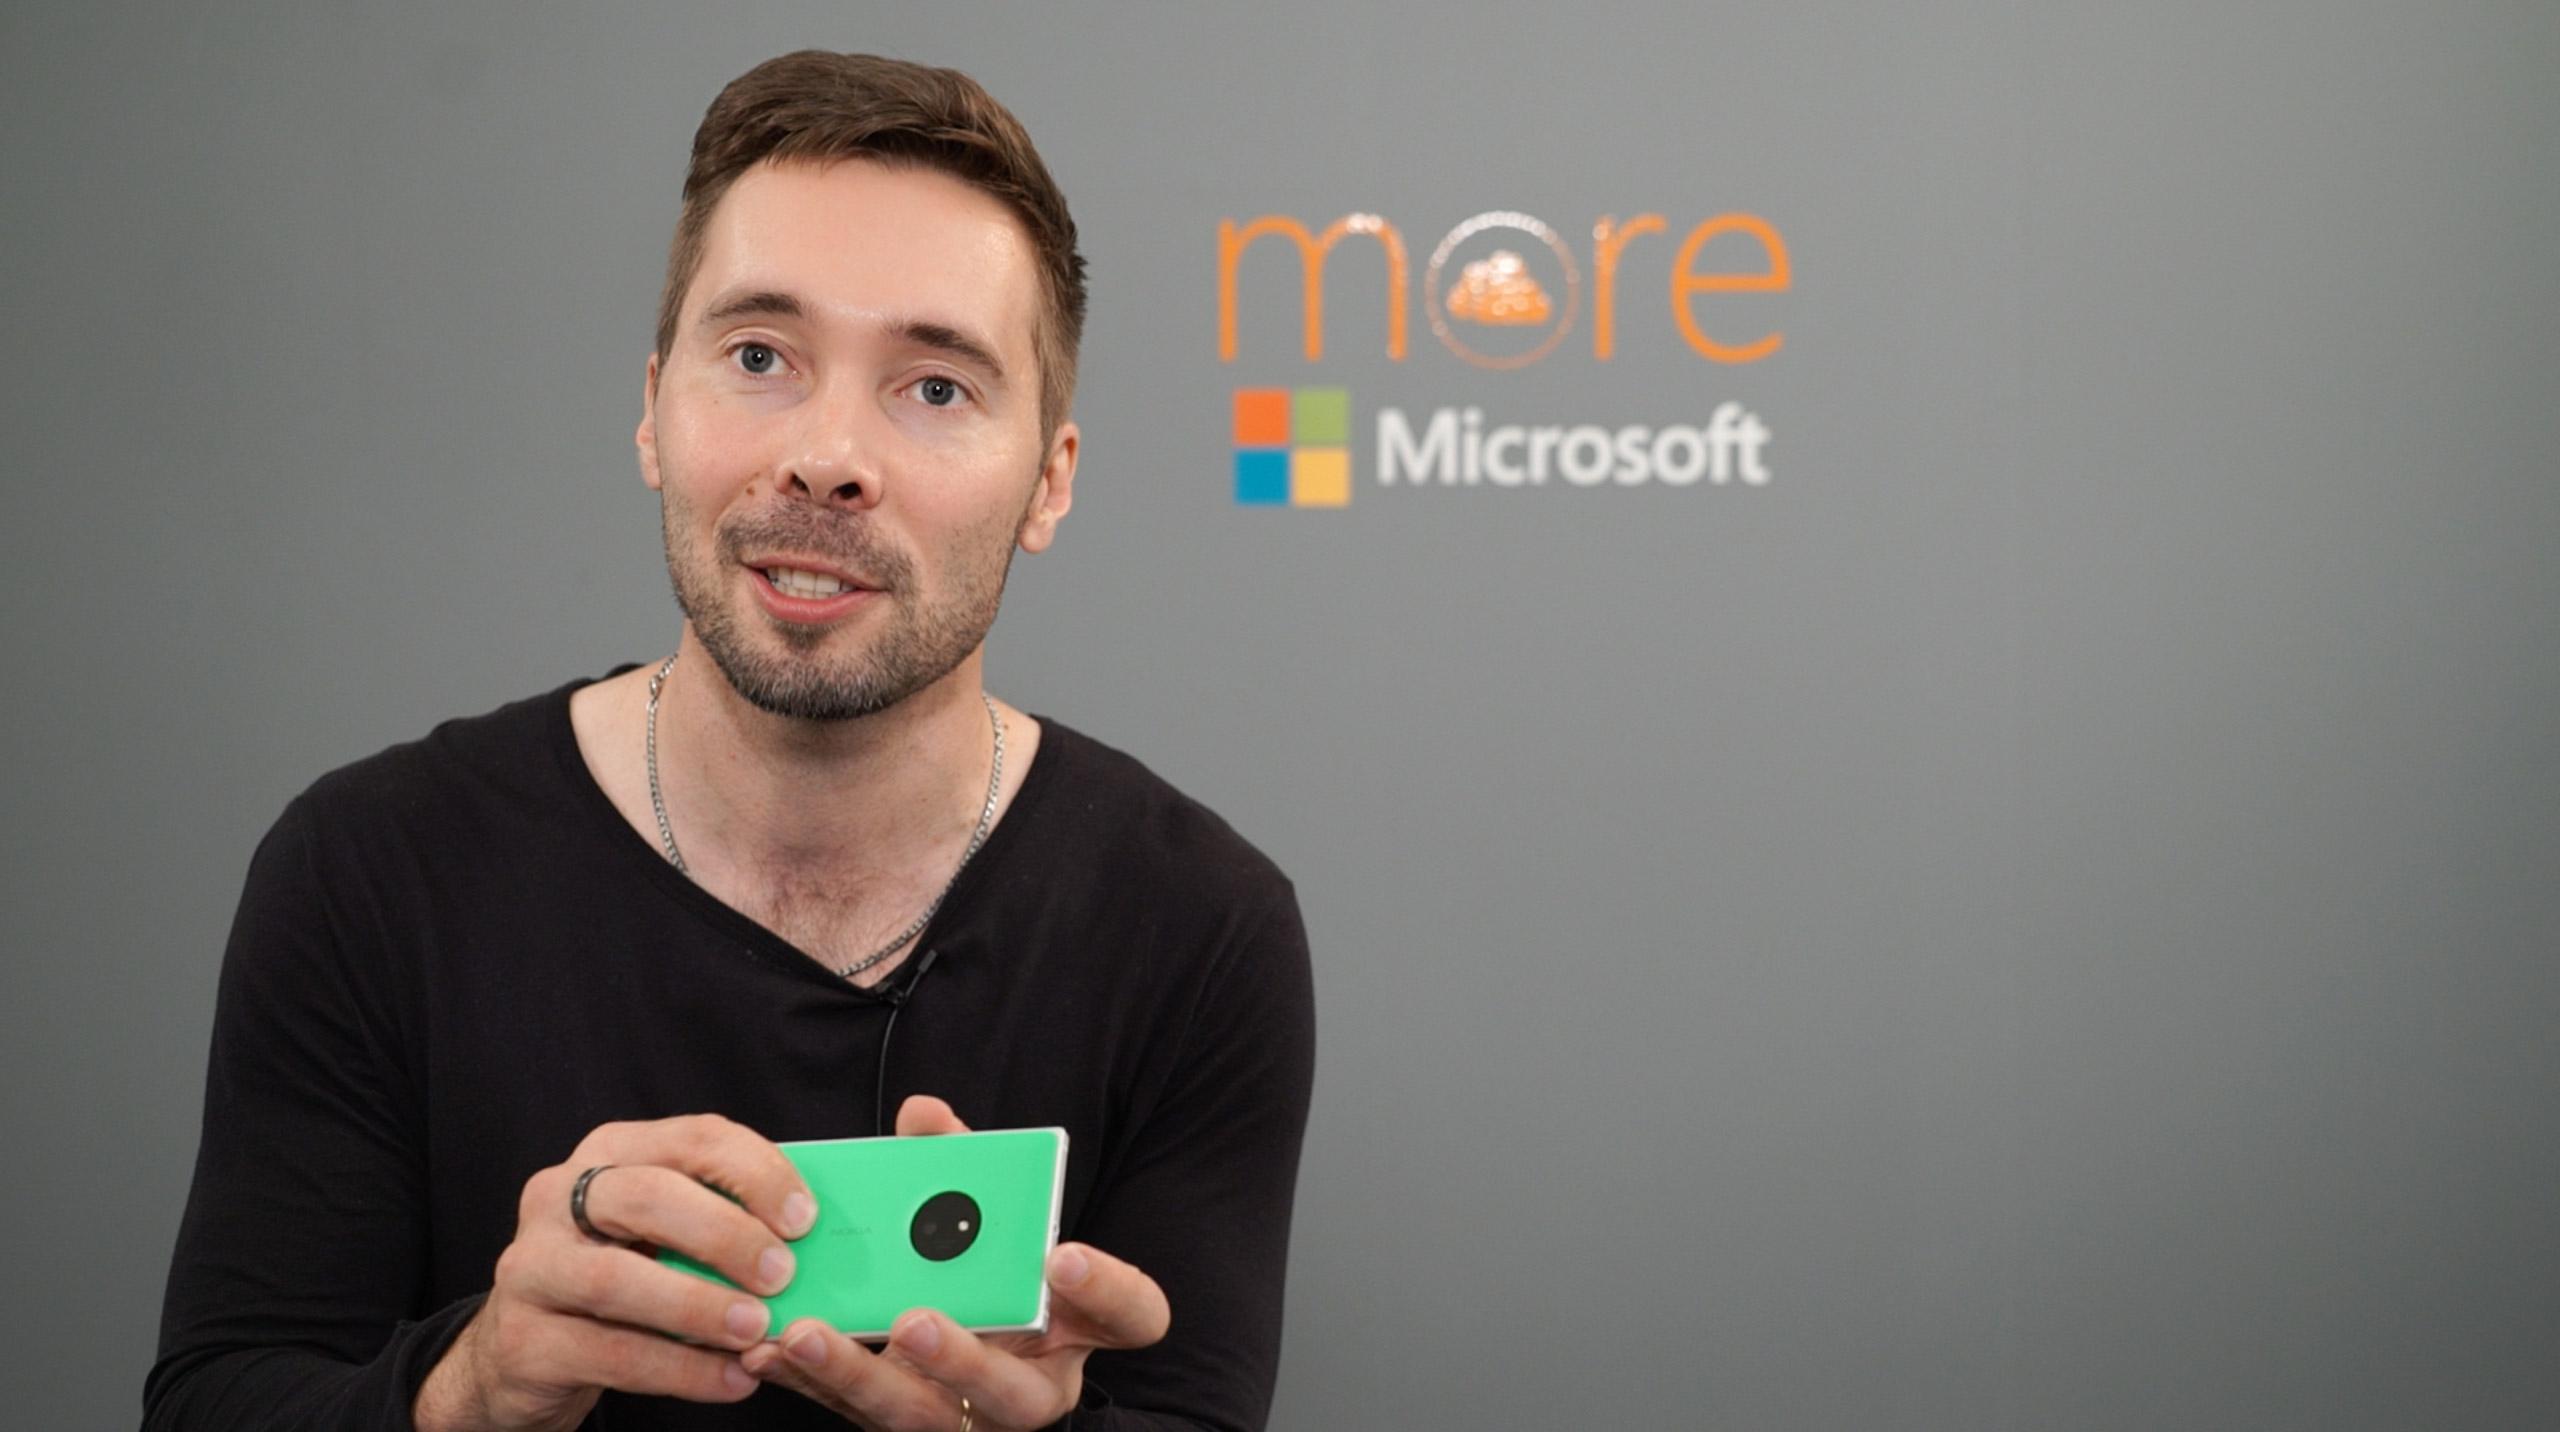 Juha Alakarhu - Microsoft Nokia Lumia